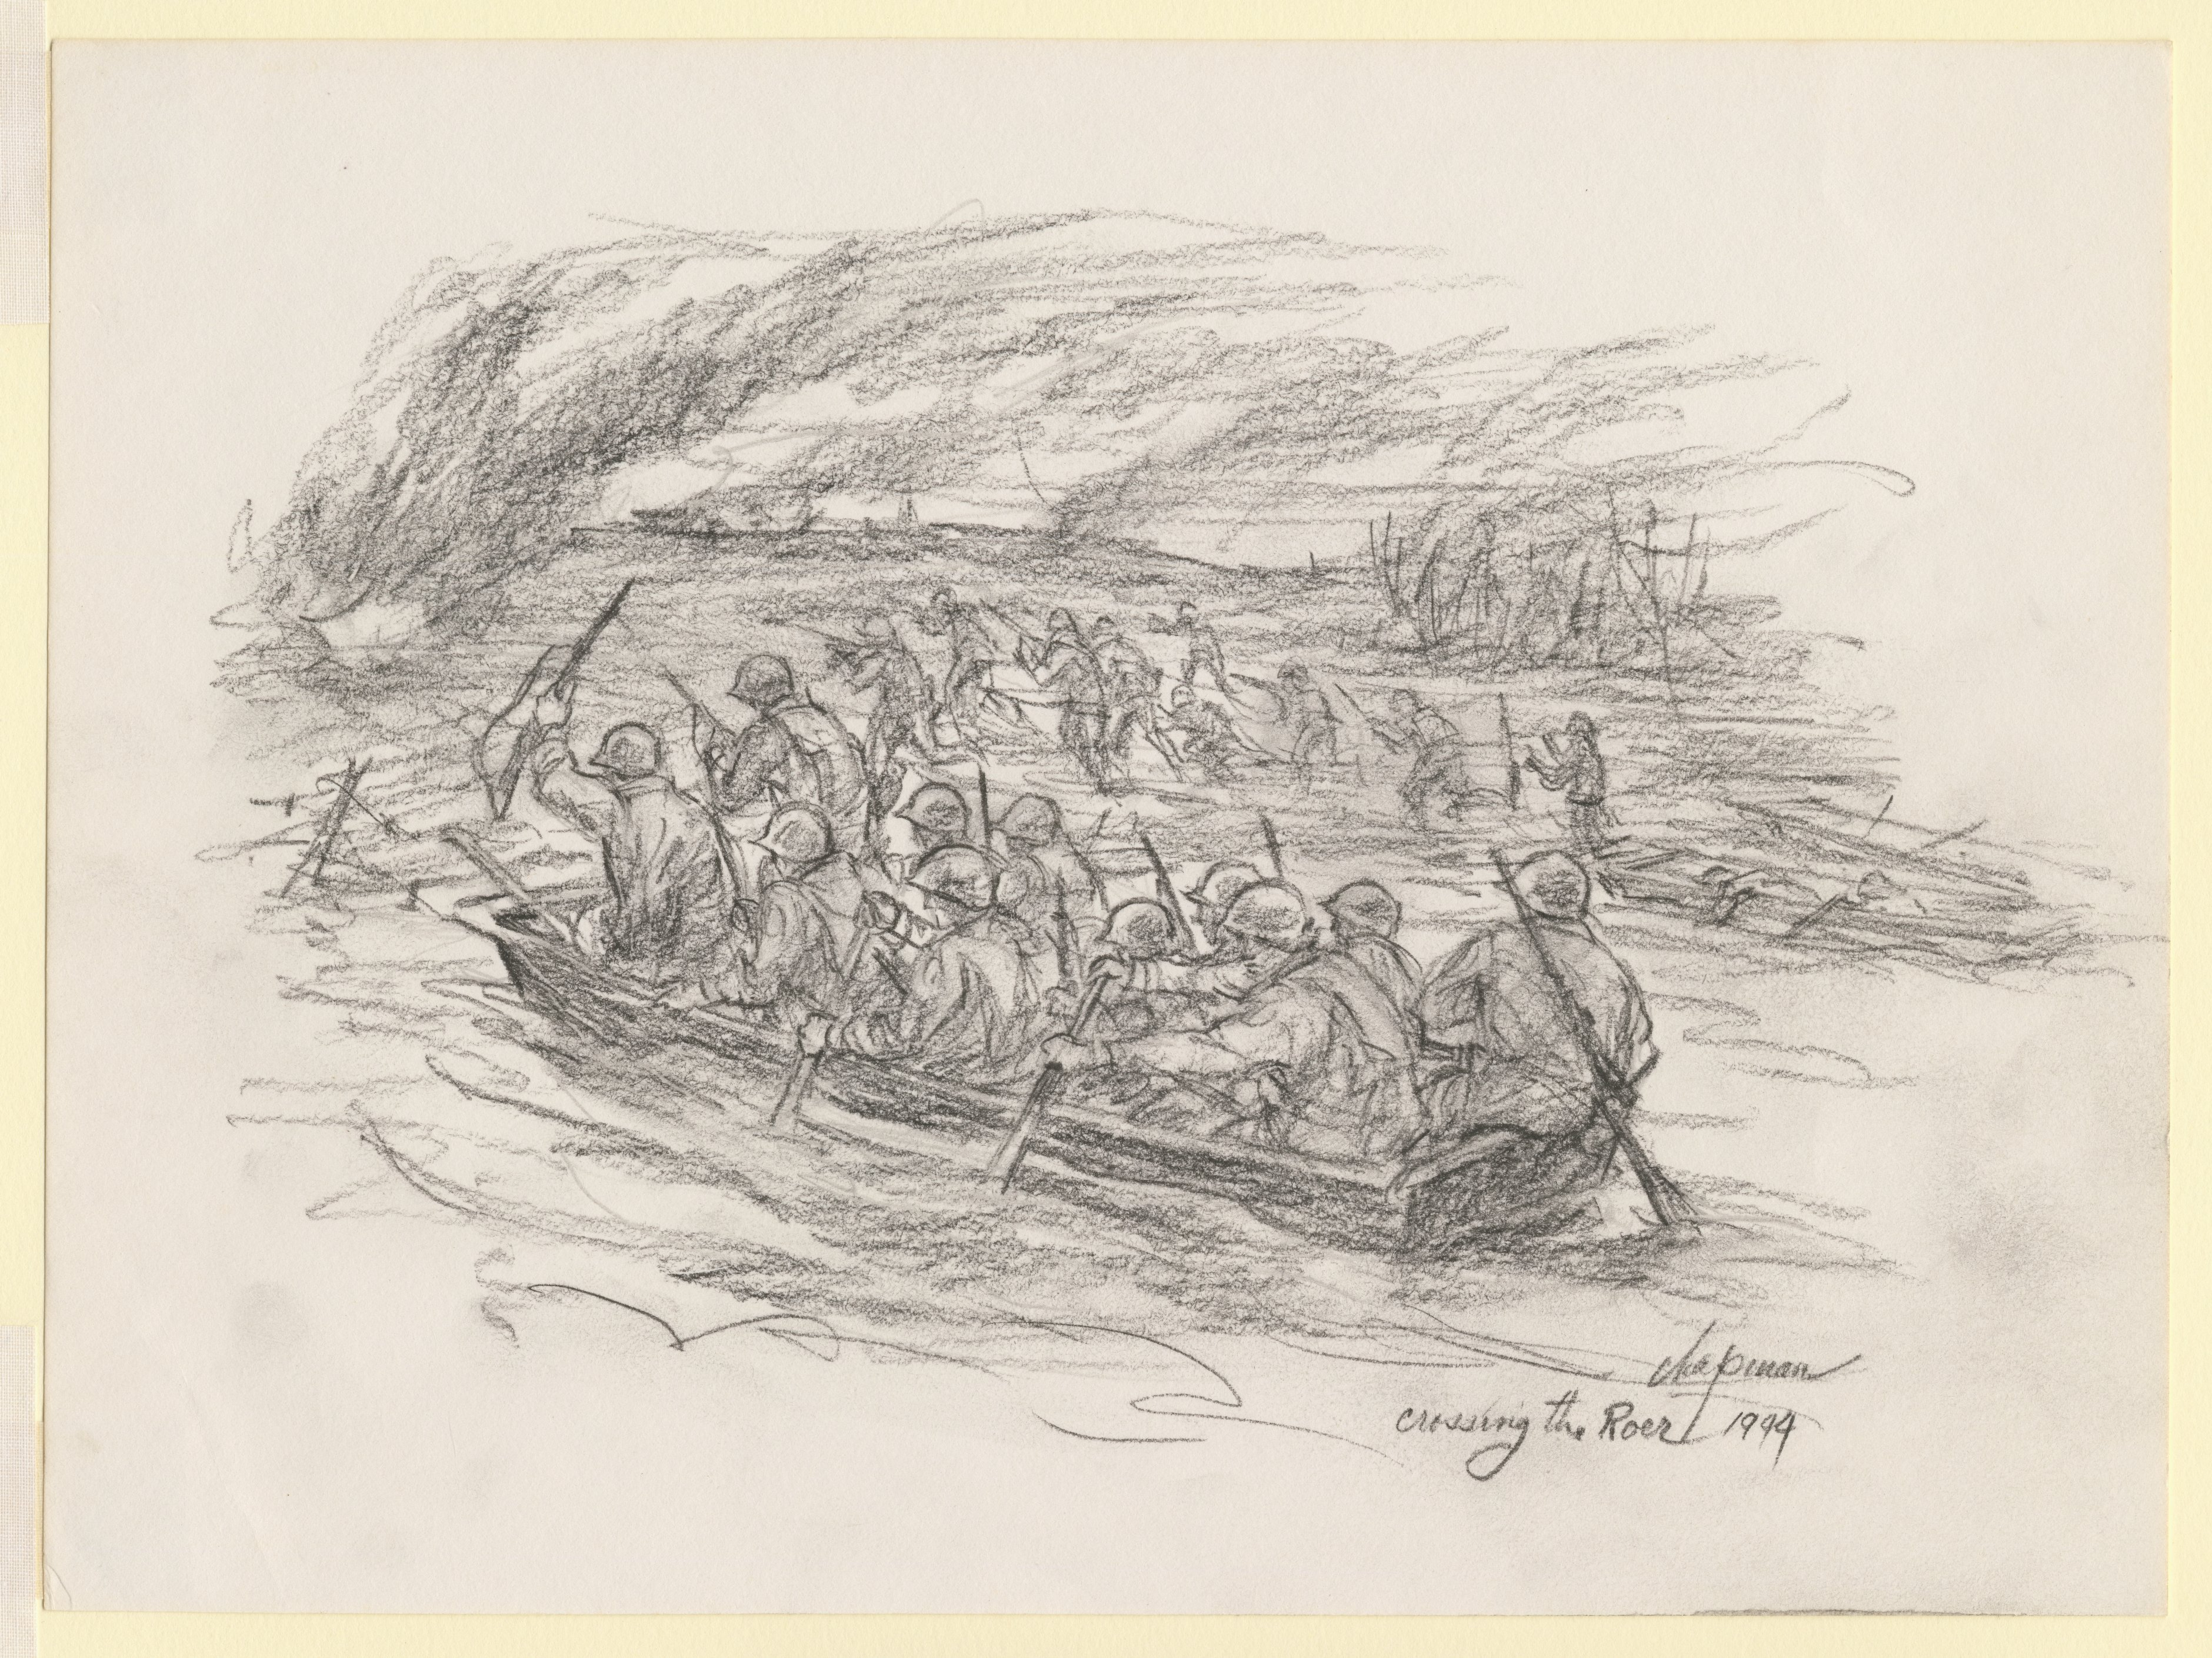 Walter Chapman S World War Two Drawings Anne S K Brown